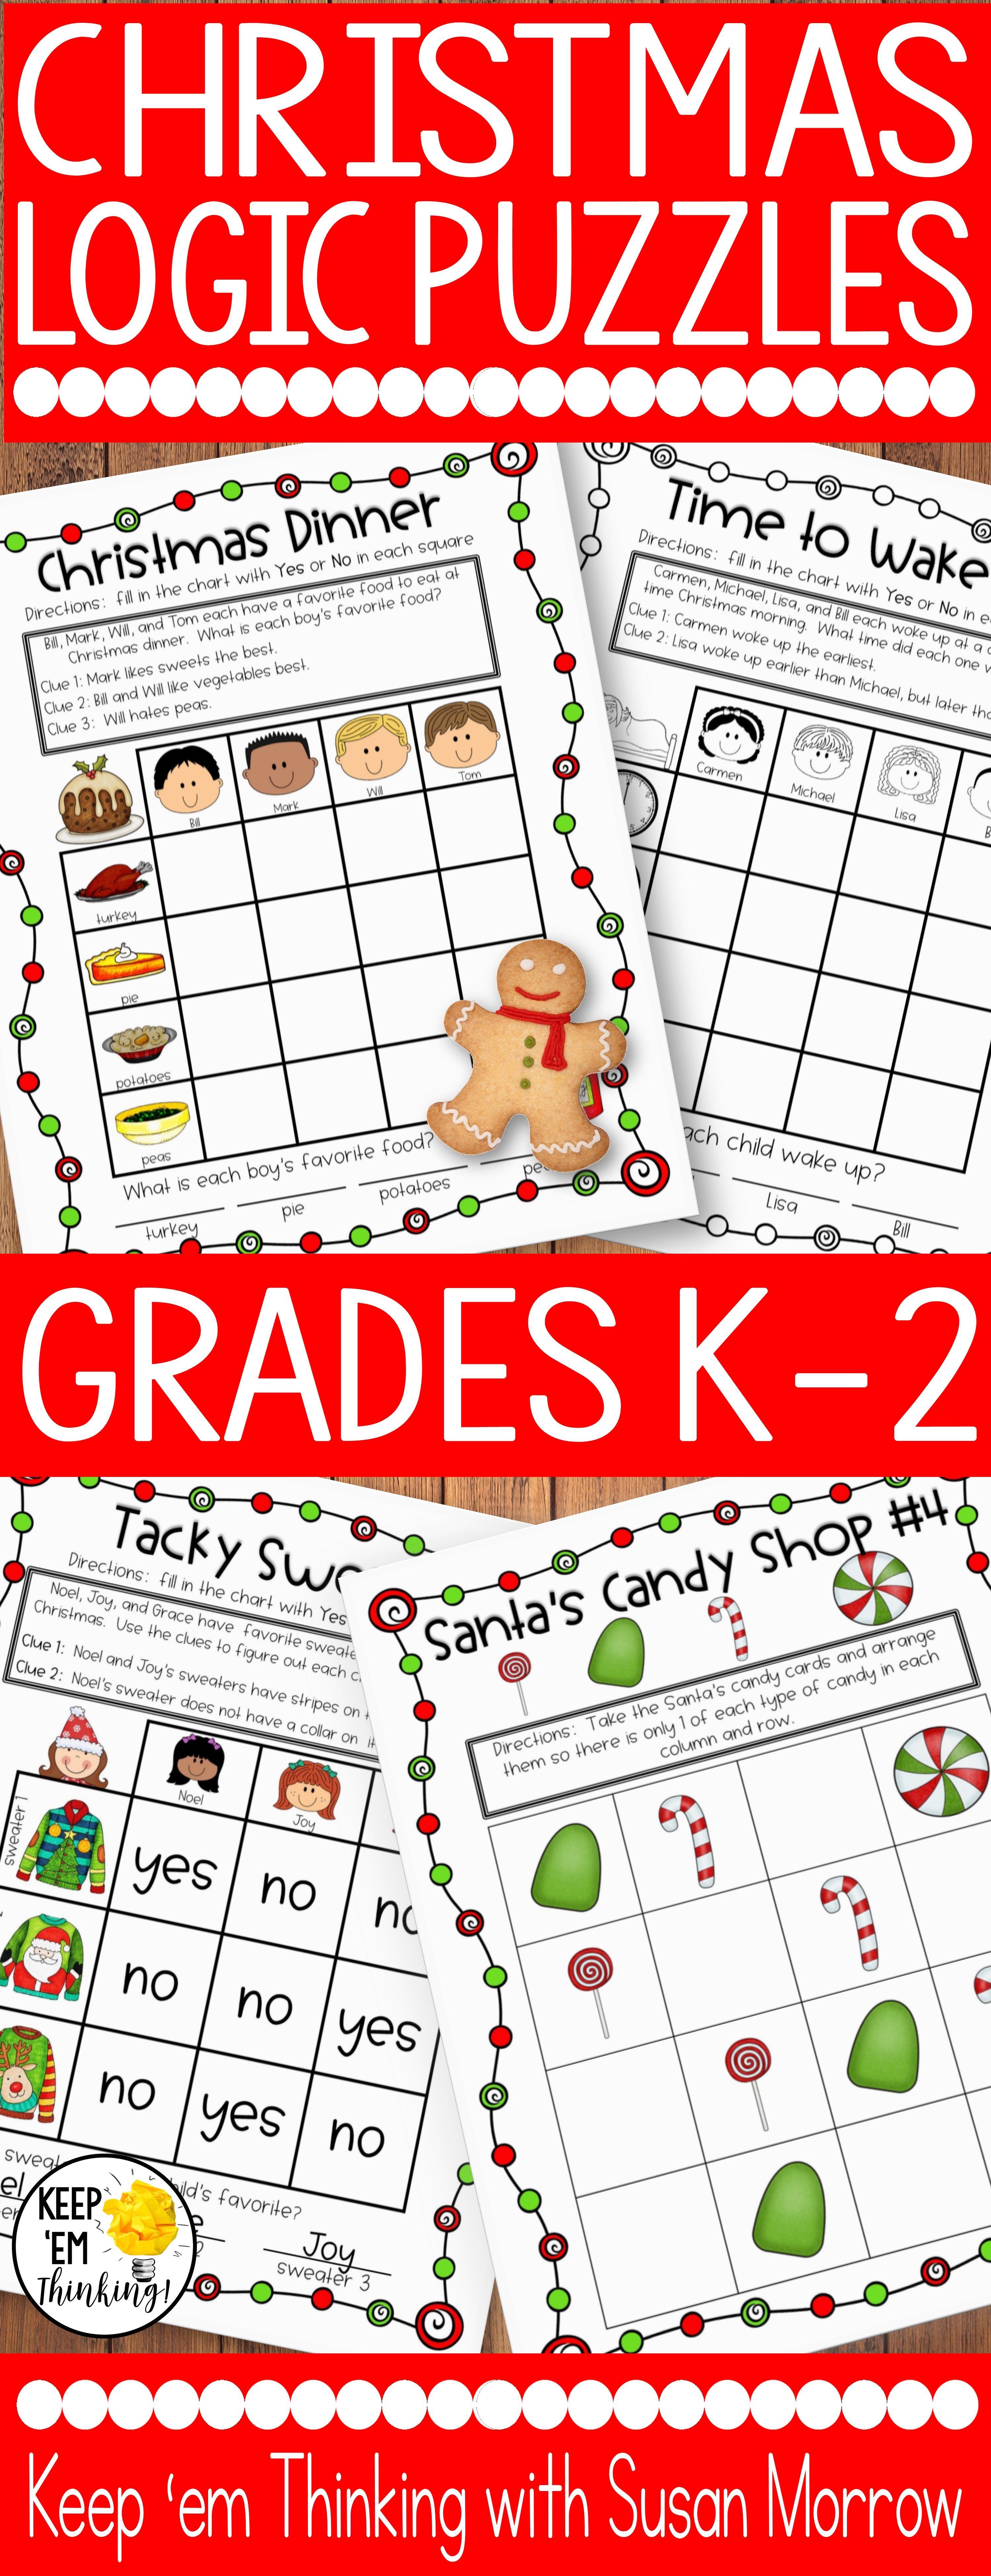 medium resolution of These Christmas Theme logic puzzles